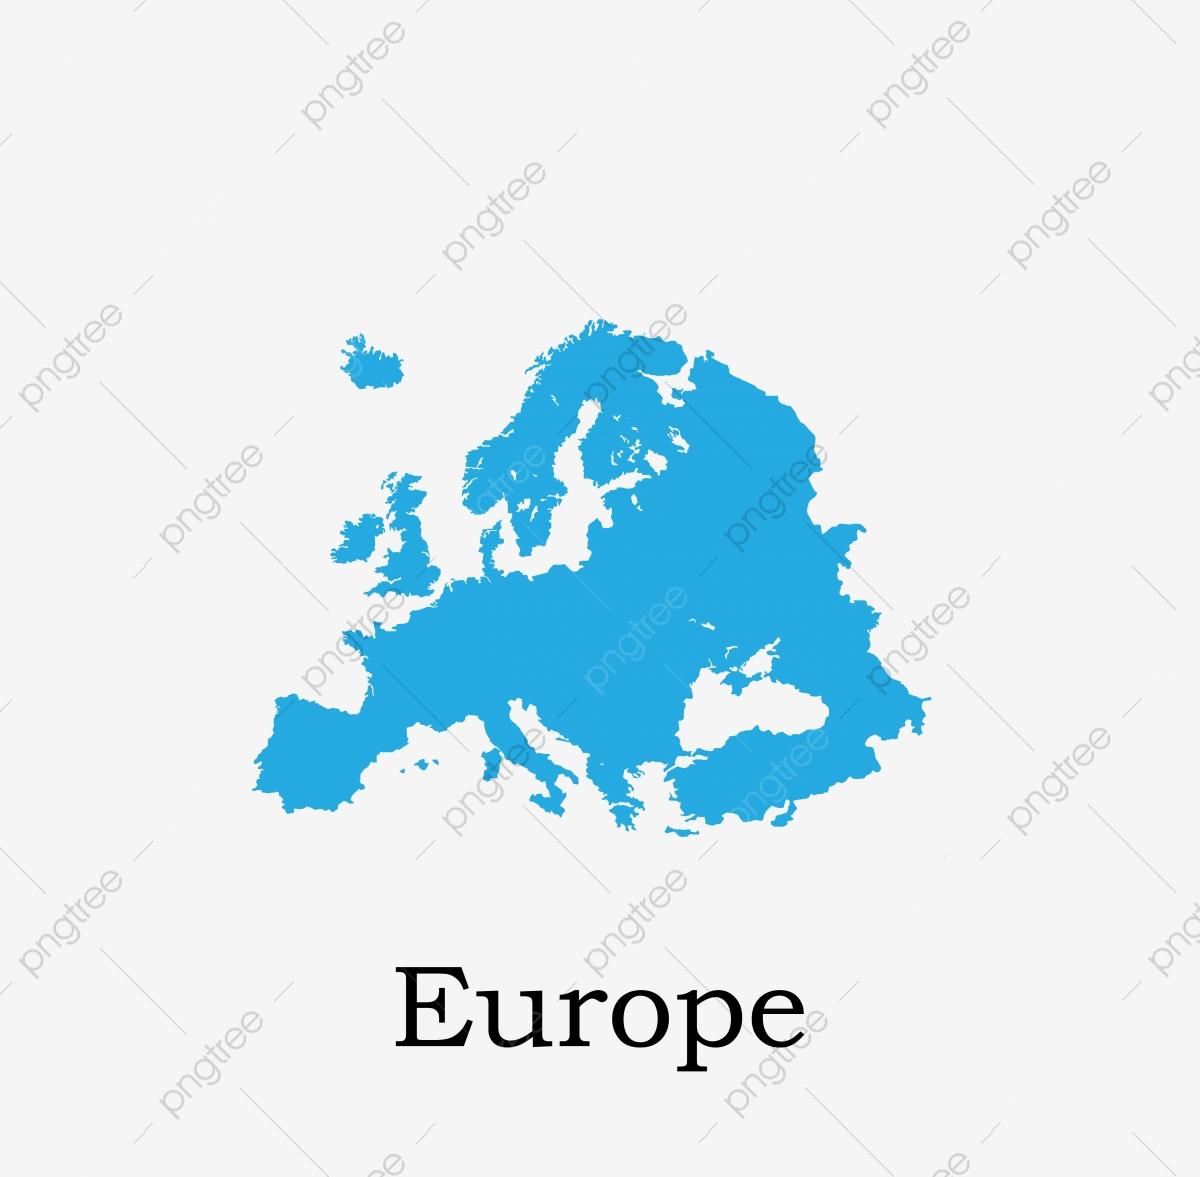 Mapa De Europa Png.Mapa De Europa Continente Europa Ubicacion Png Y Vector